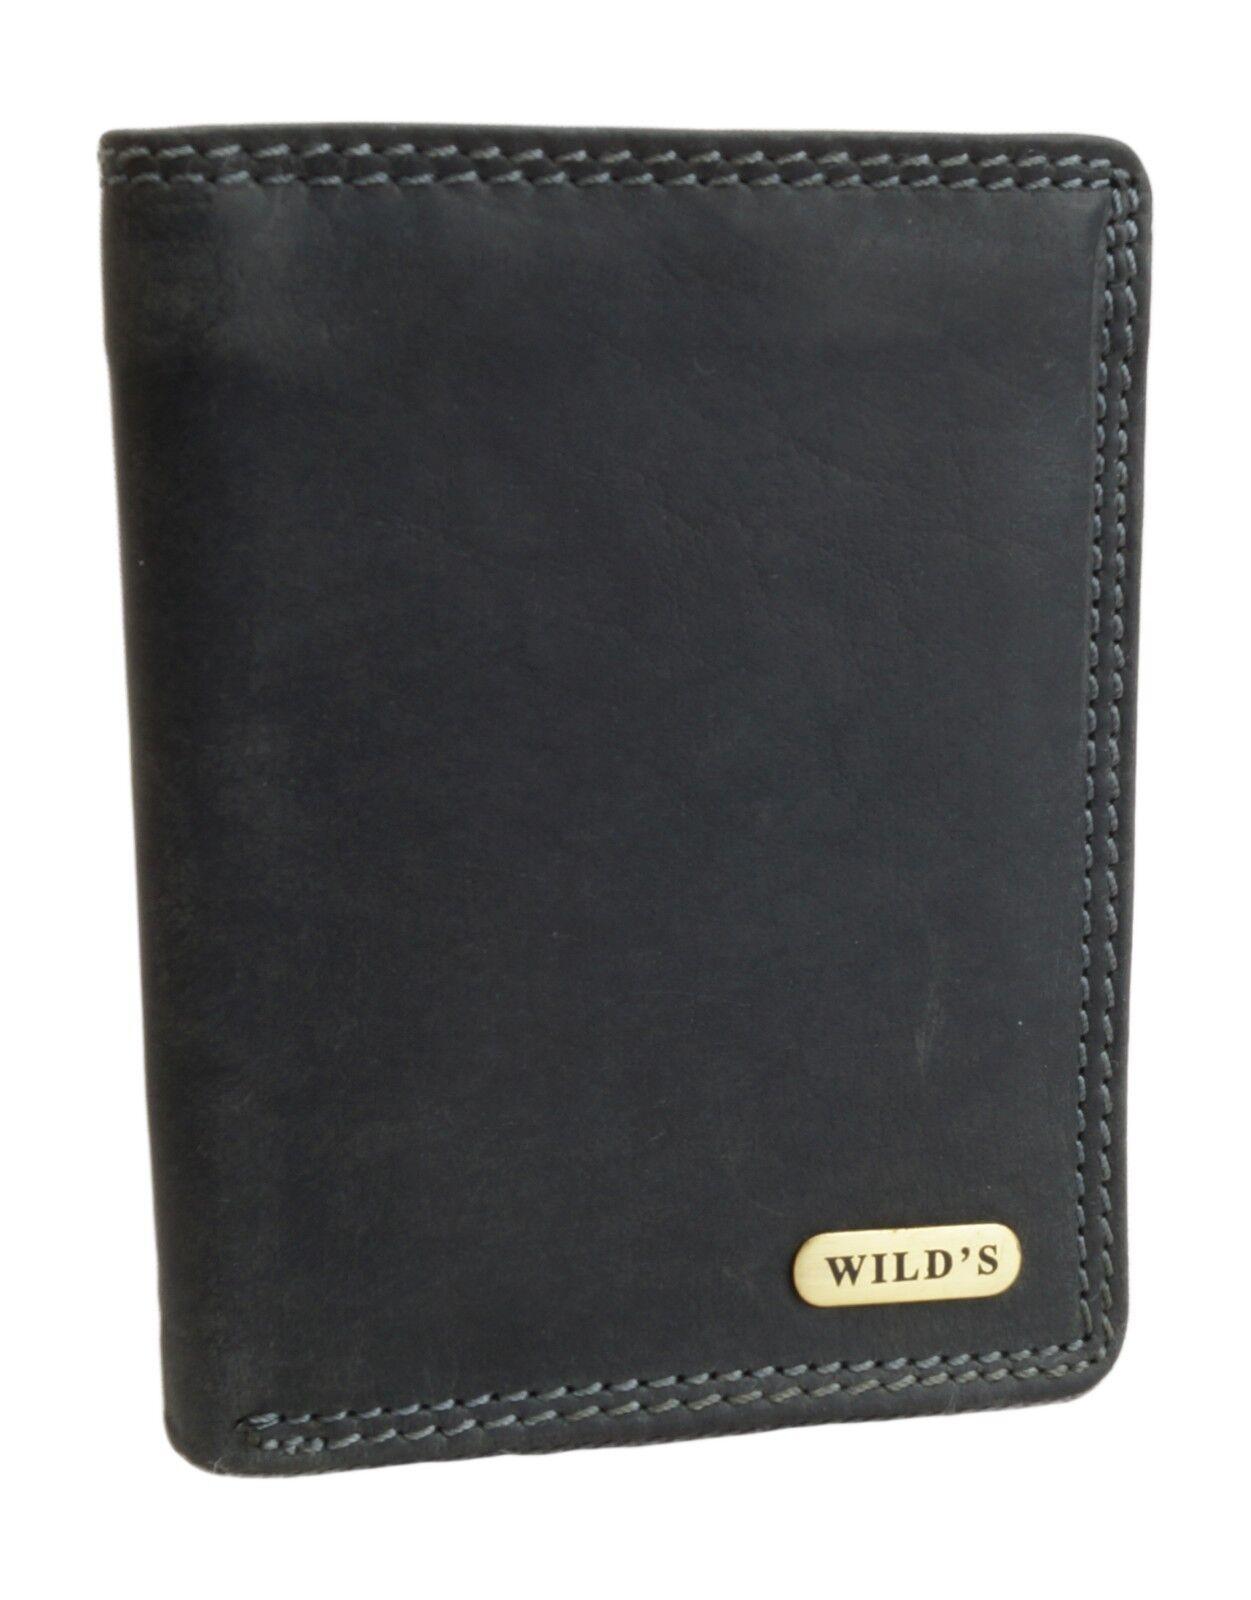 * Mens Wallet Wild's Biker Purse Small Wallet Wallet Black 1599 *